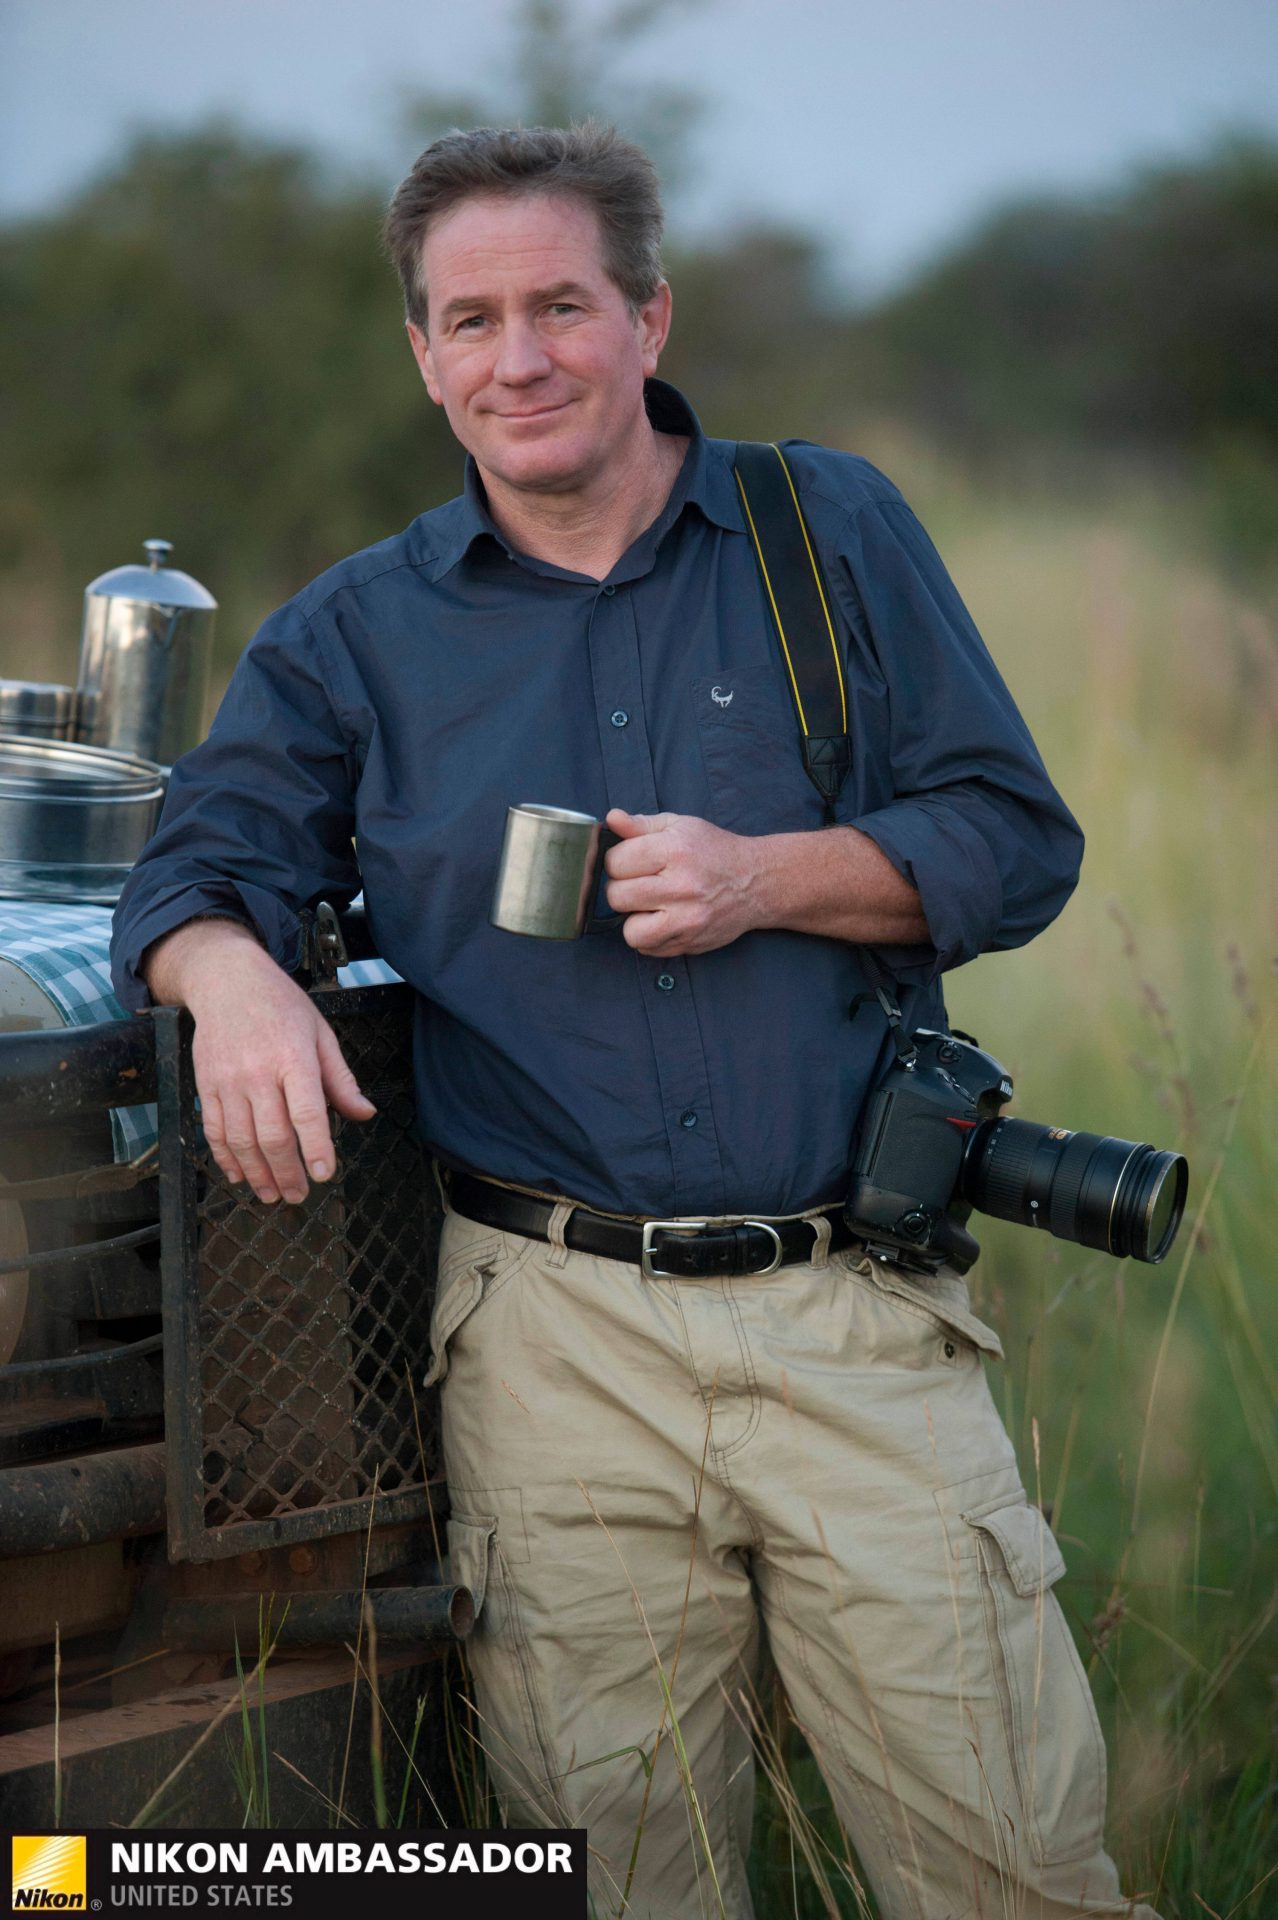 Photo: A Joel Sartore headshot with the Nikon Ambassador watermark.